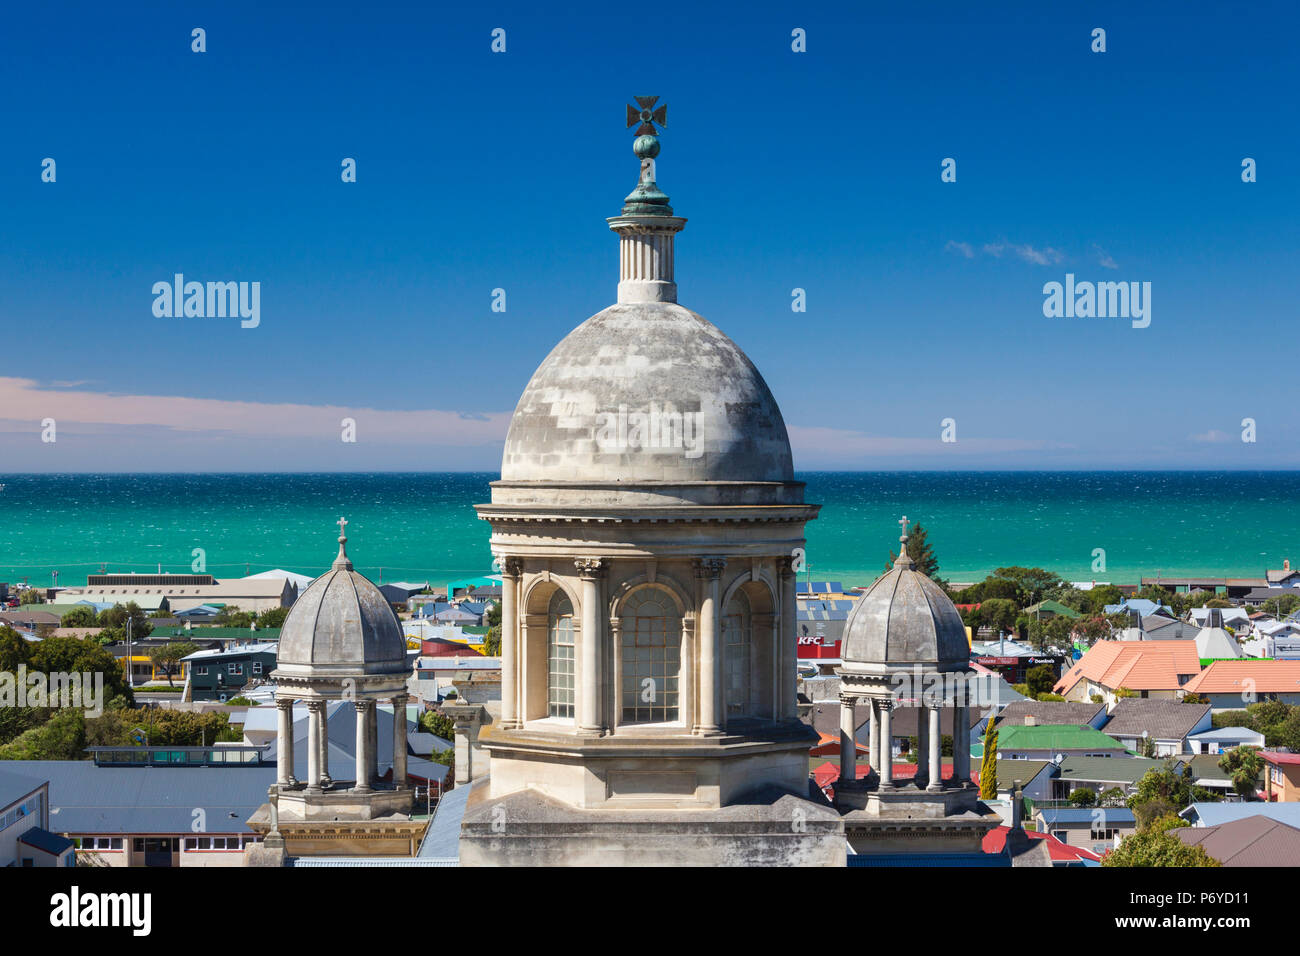 Neuseeland, Südinsel, Otago Oamaru, erhöhten Blick auf die St. Patrick's Basilika Stockbild